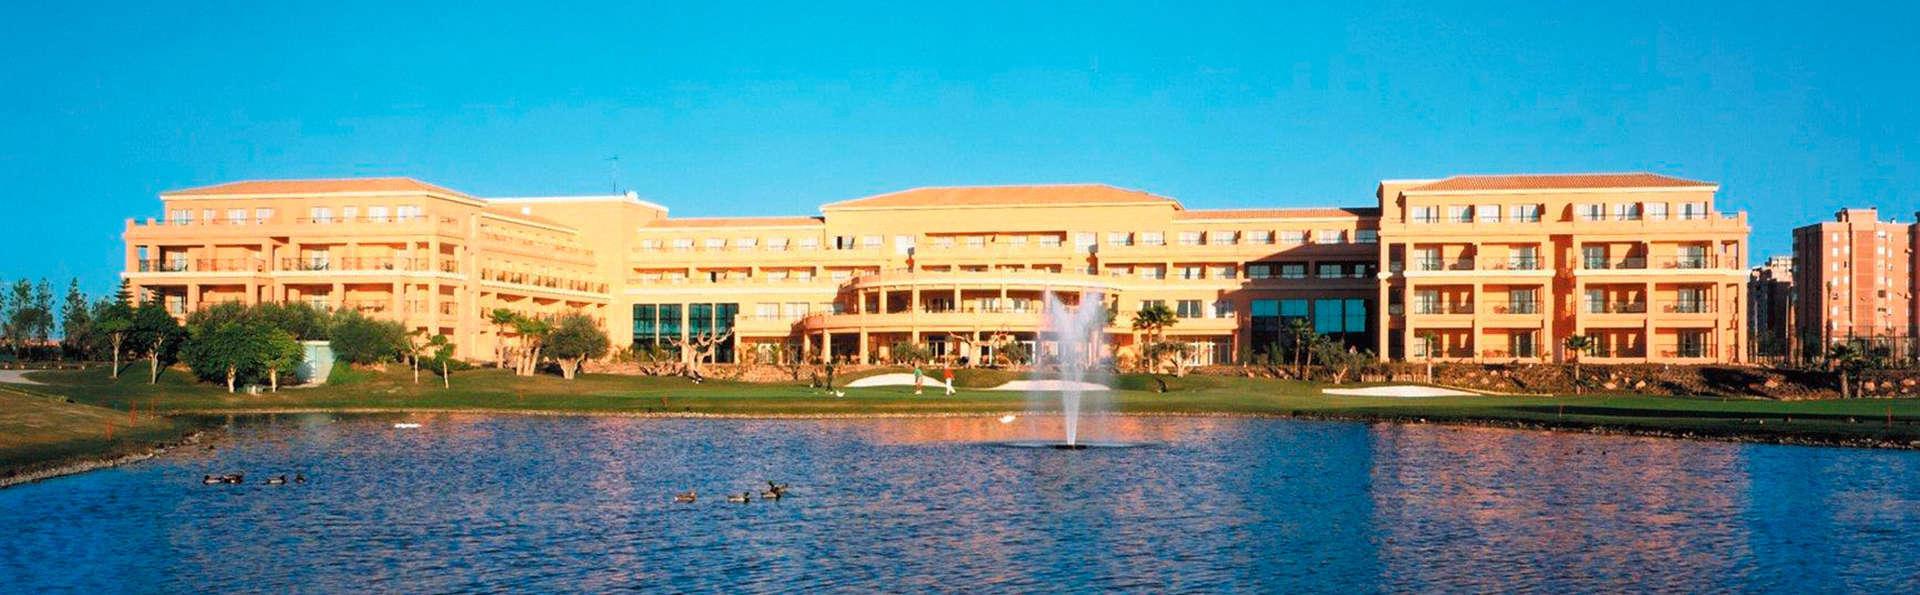 Hotel Alicante Golf - EDIT_front.jpg